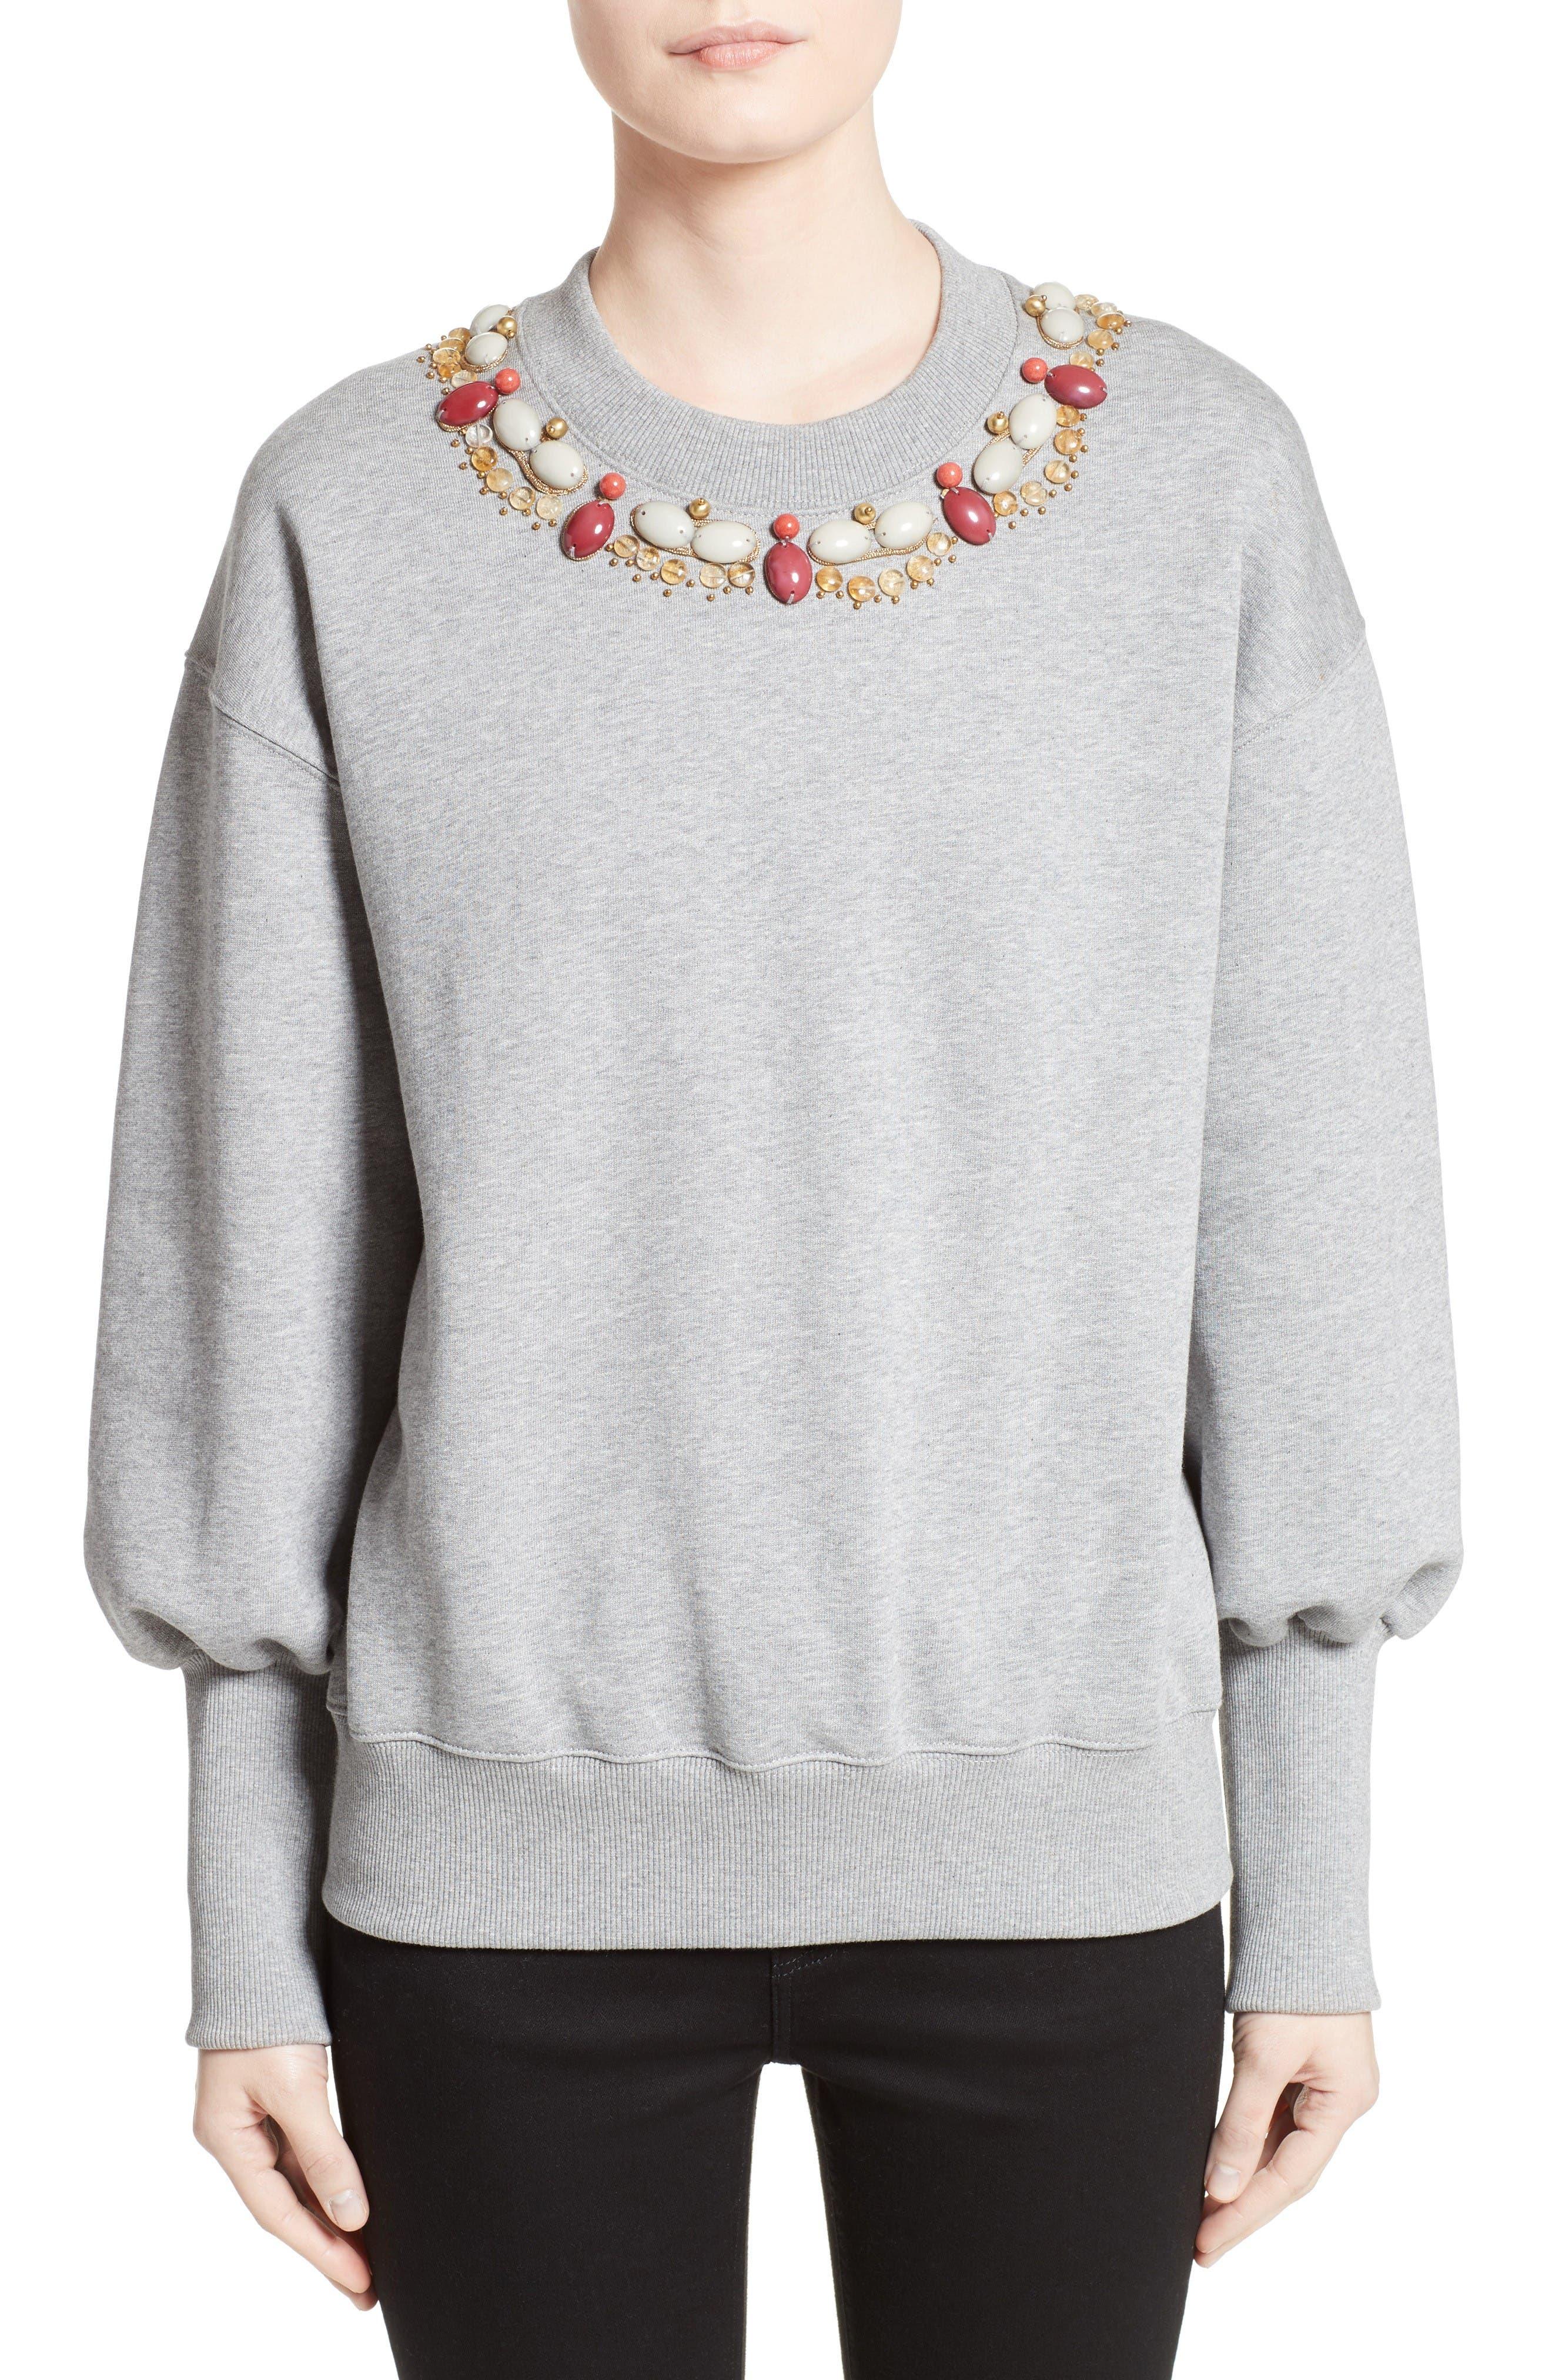 Juliano Embellished Sweatshirt,                             Main thumbnail 1, color,                             Pale Grey Melange